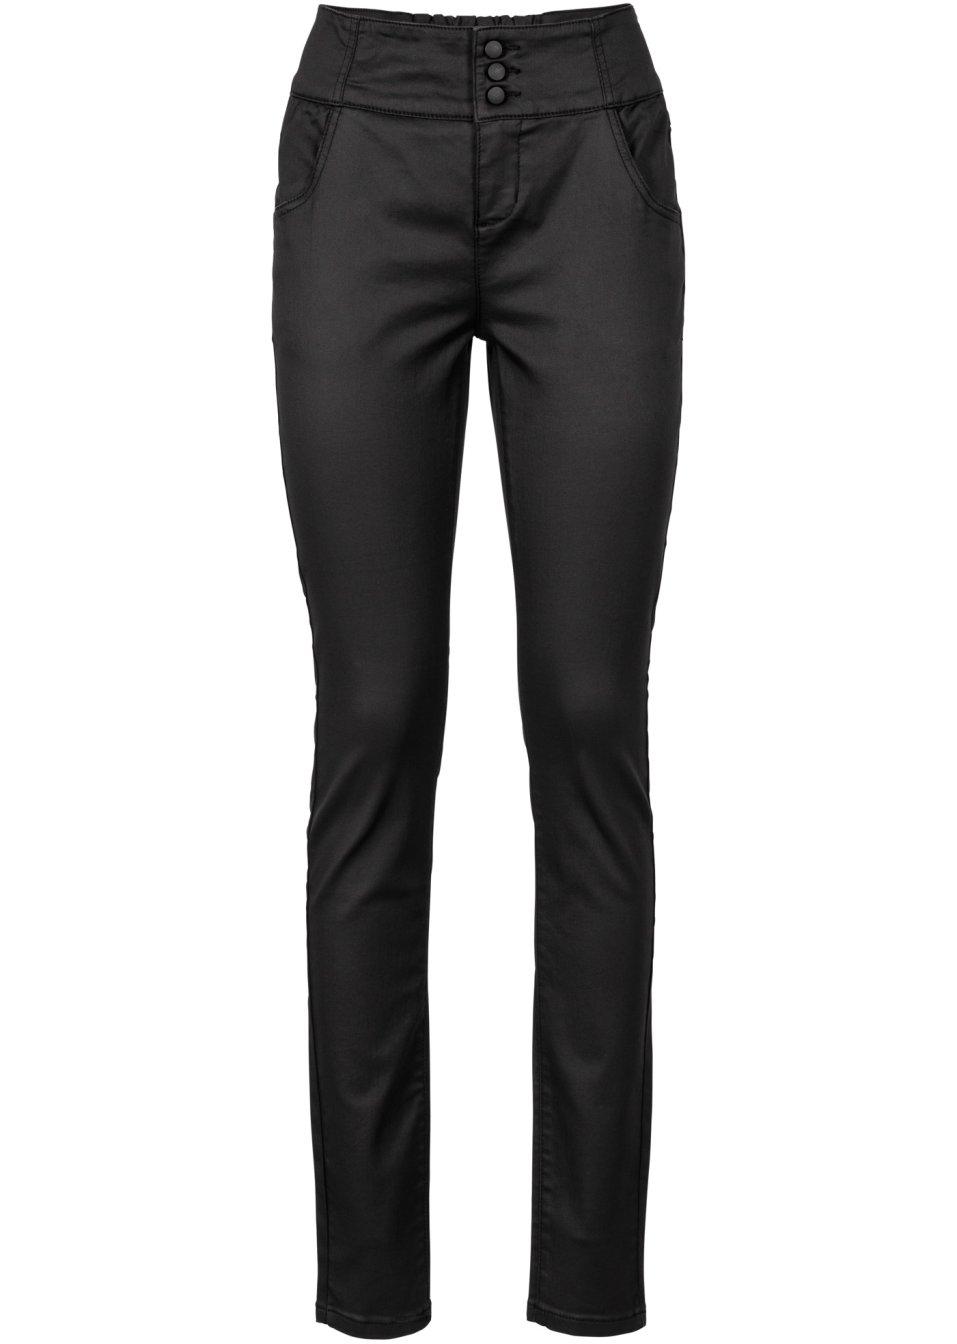 pantalon extensible enduit noir femme bodyflirt. Black Bedroom Furniture Sets. Home Design Ideas